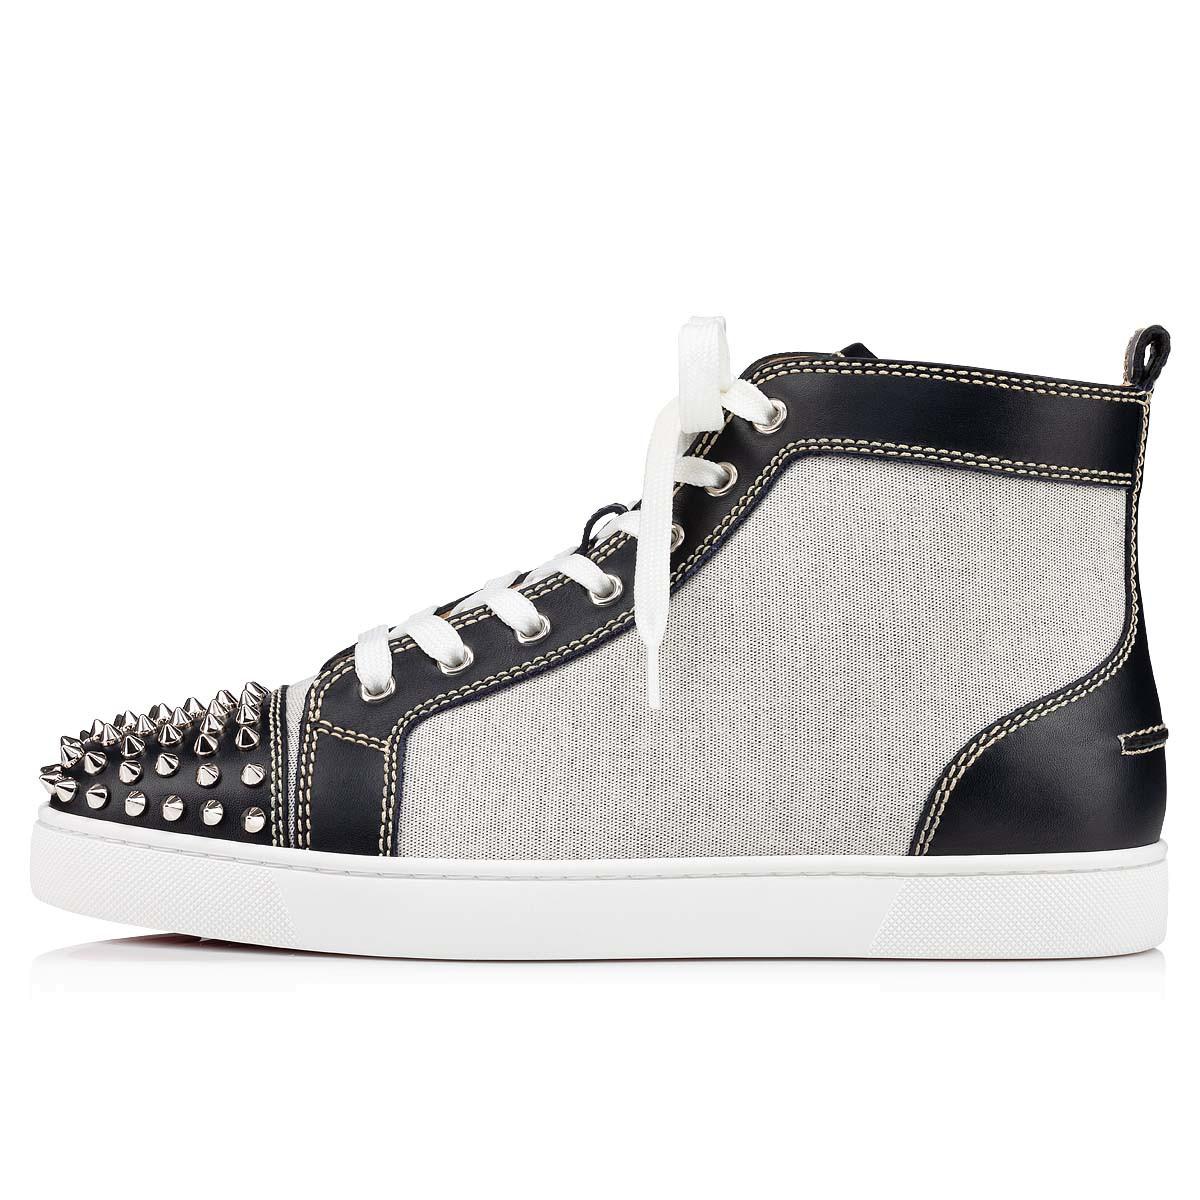 Shoes - Lou Spikes Orlato Flat - Christian Louboutin